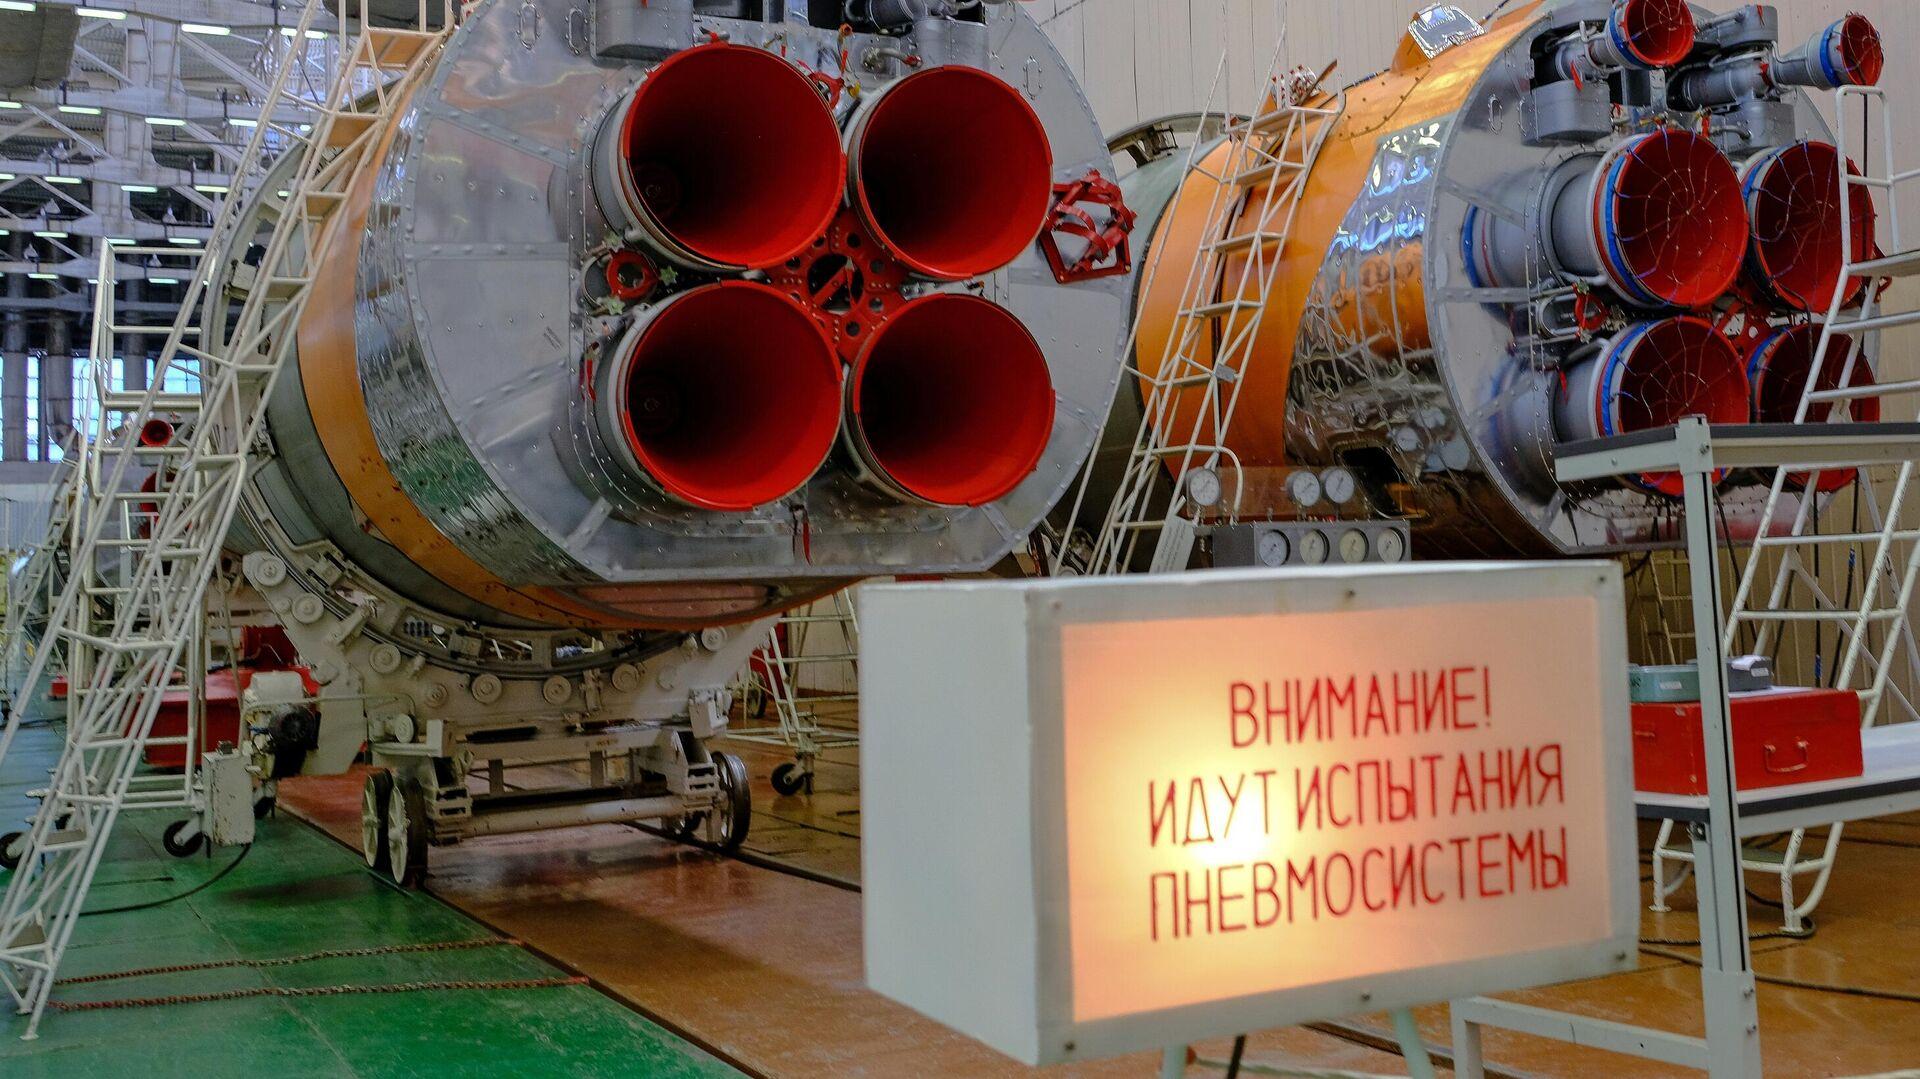 Сборка ракет-носителей Союз-2 на территории АО РКЦ Прогресс в Самаре - РИА Новости, 1920, 09.02.2021